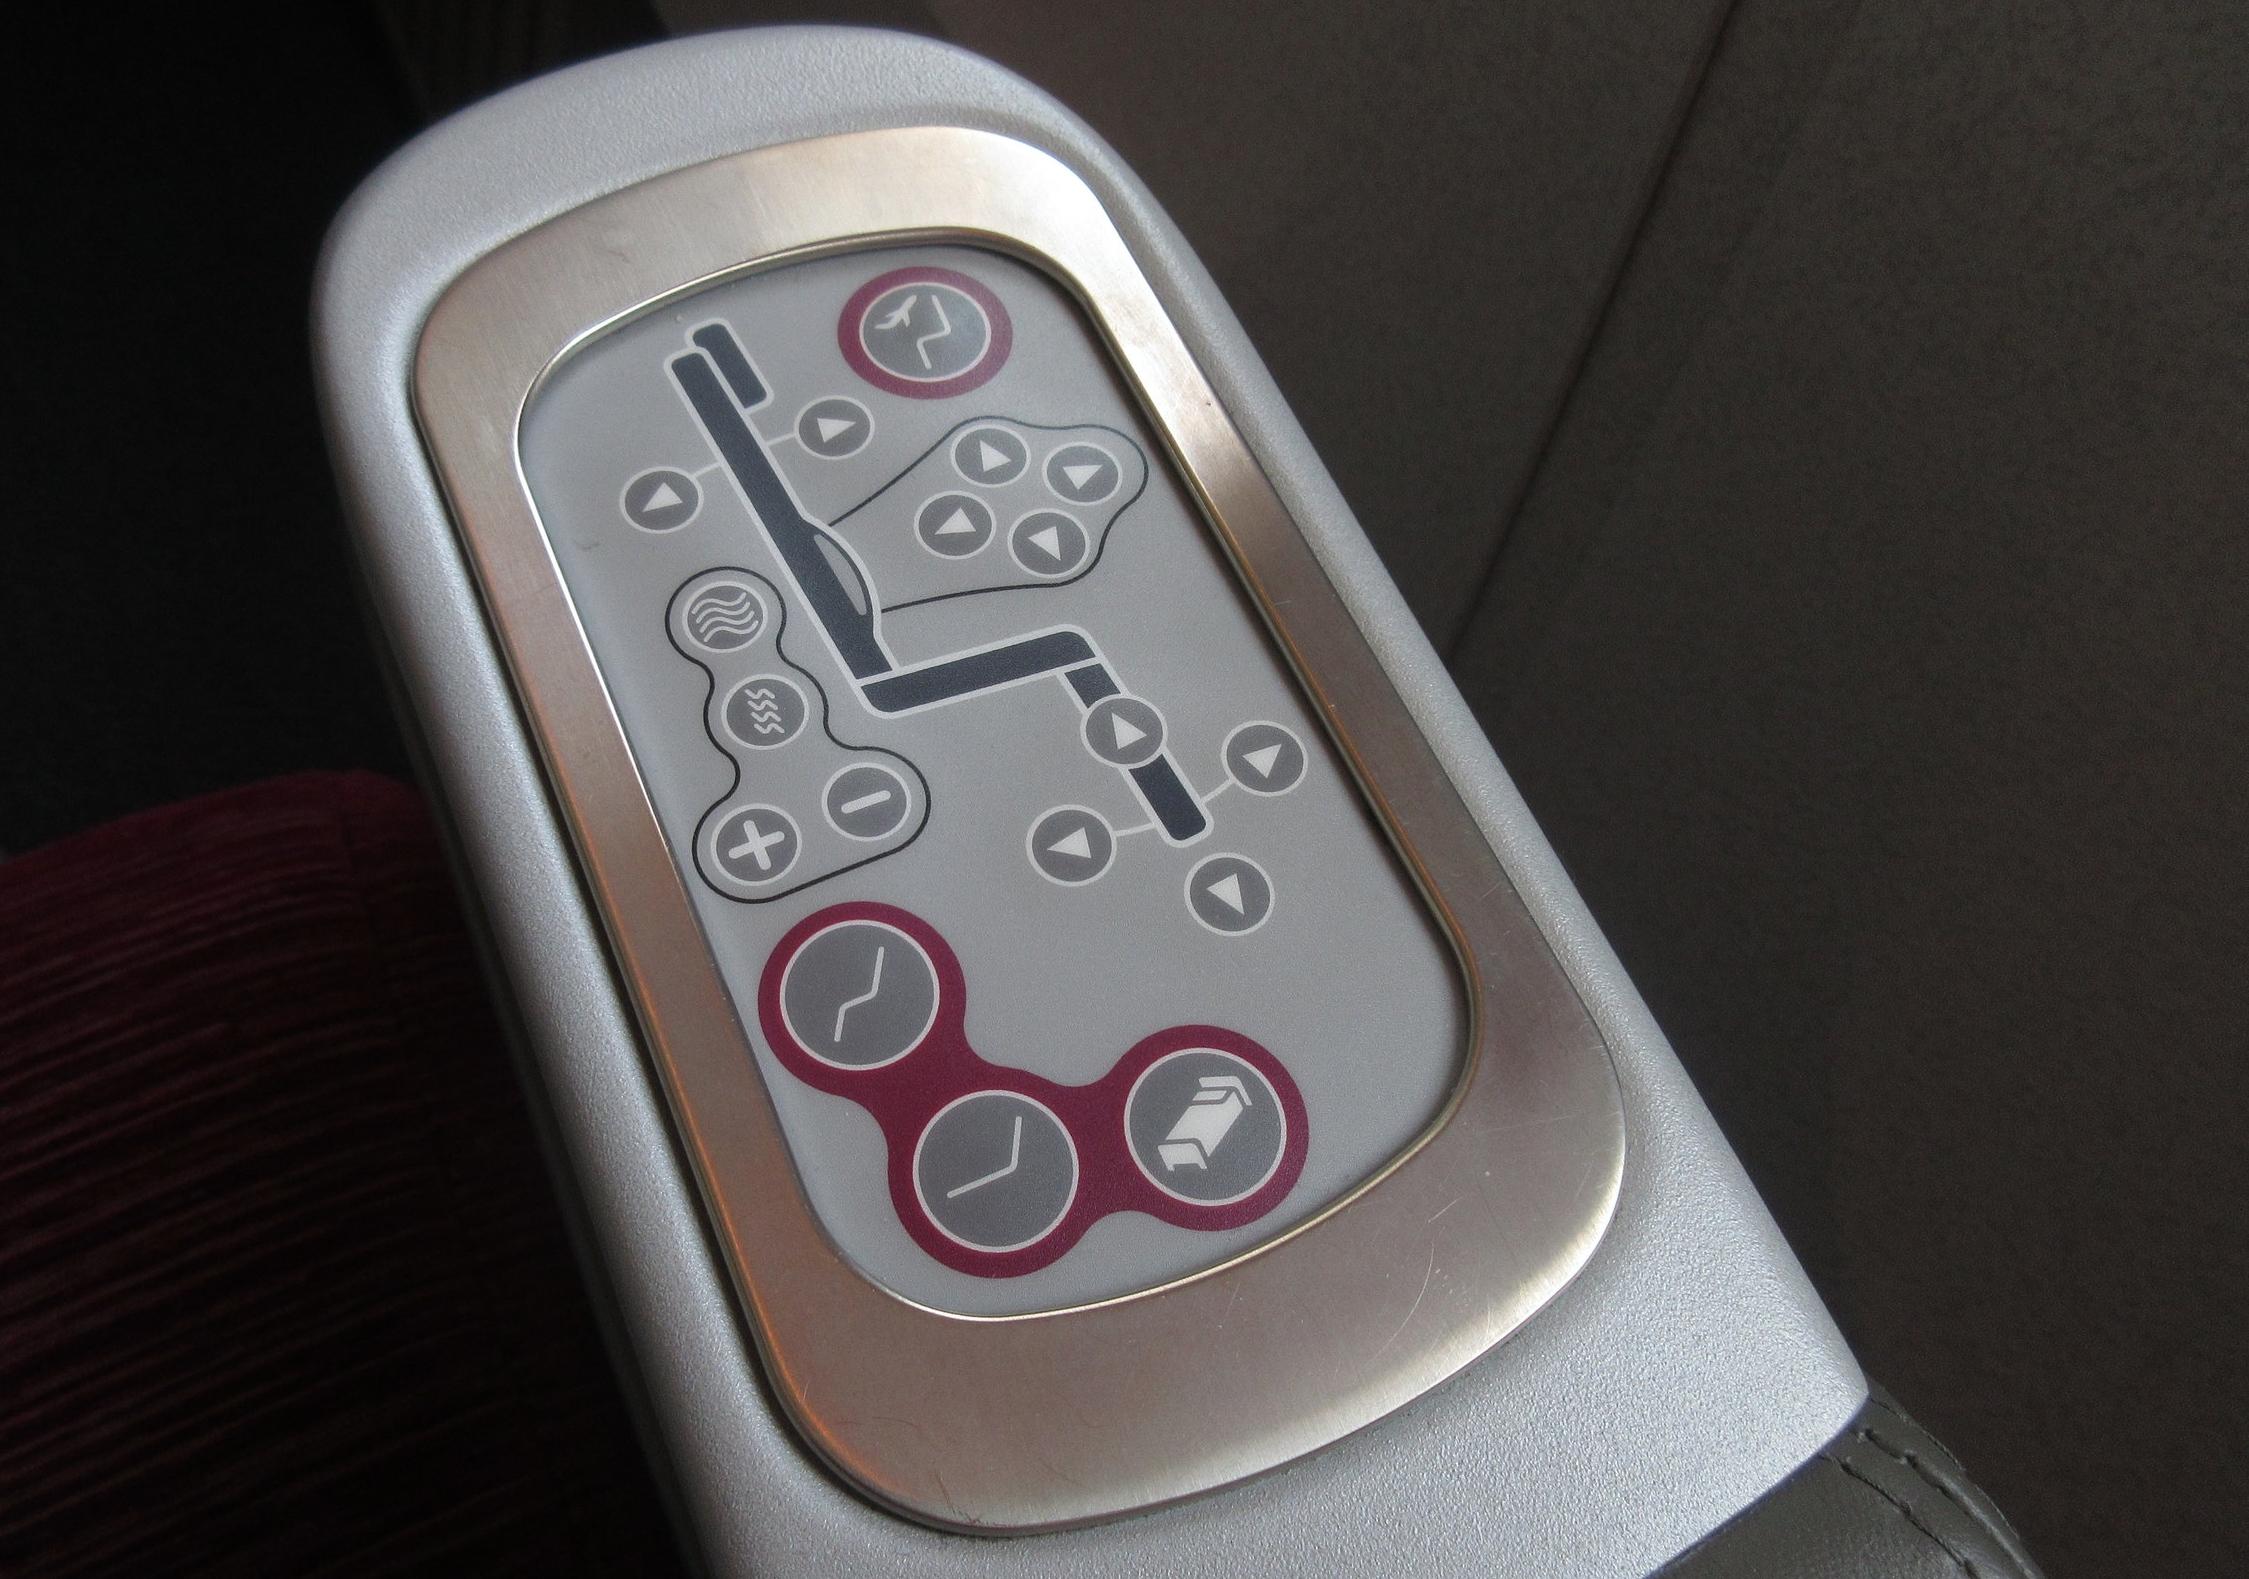 Qatar Airways 777 business class – Seat controls